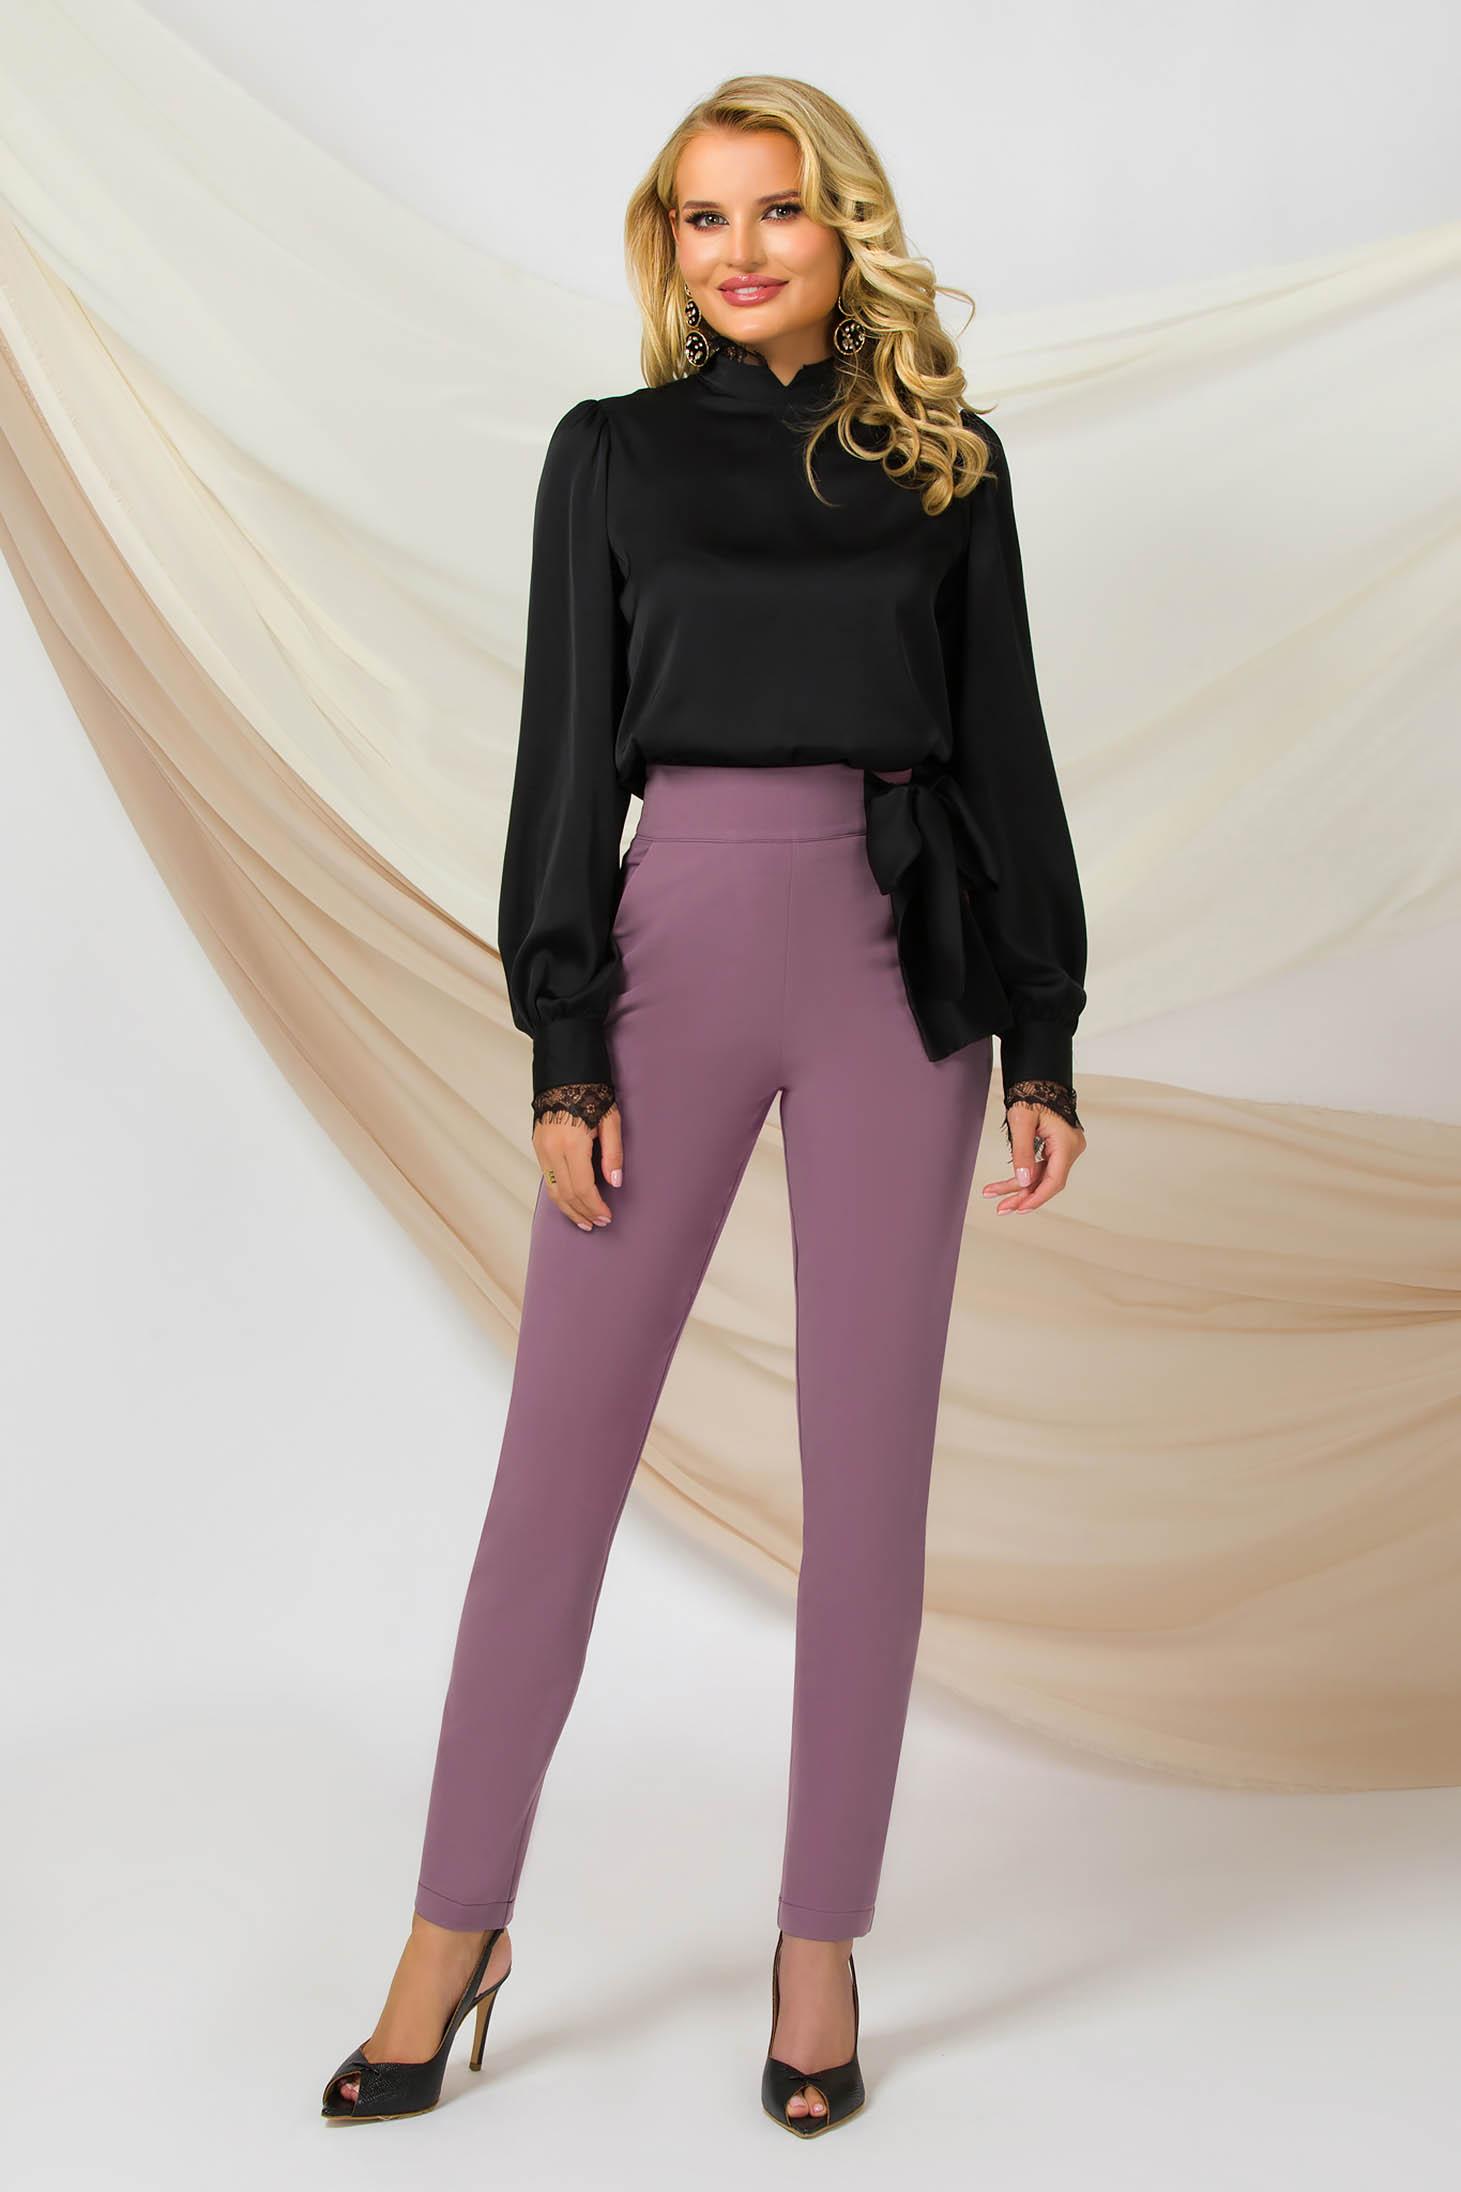 Pantaloni PrettyGirl roz prafuit conici cu talie inalta office din material usor elastic care se leaga cu o funda satinata